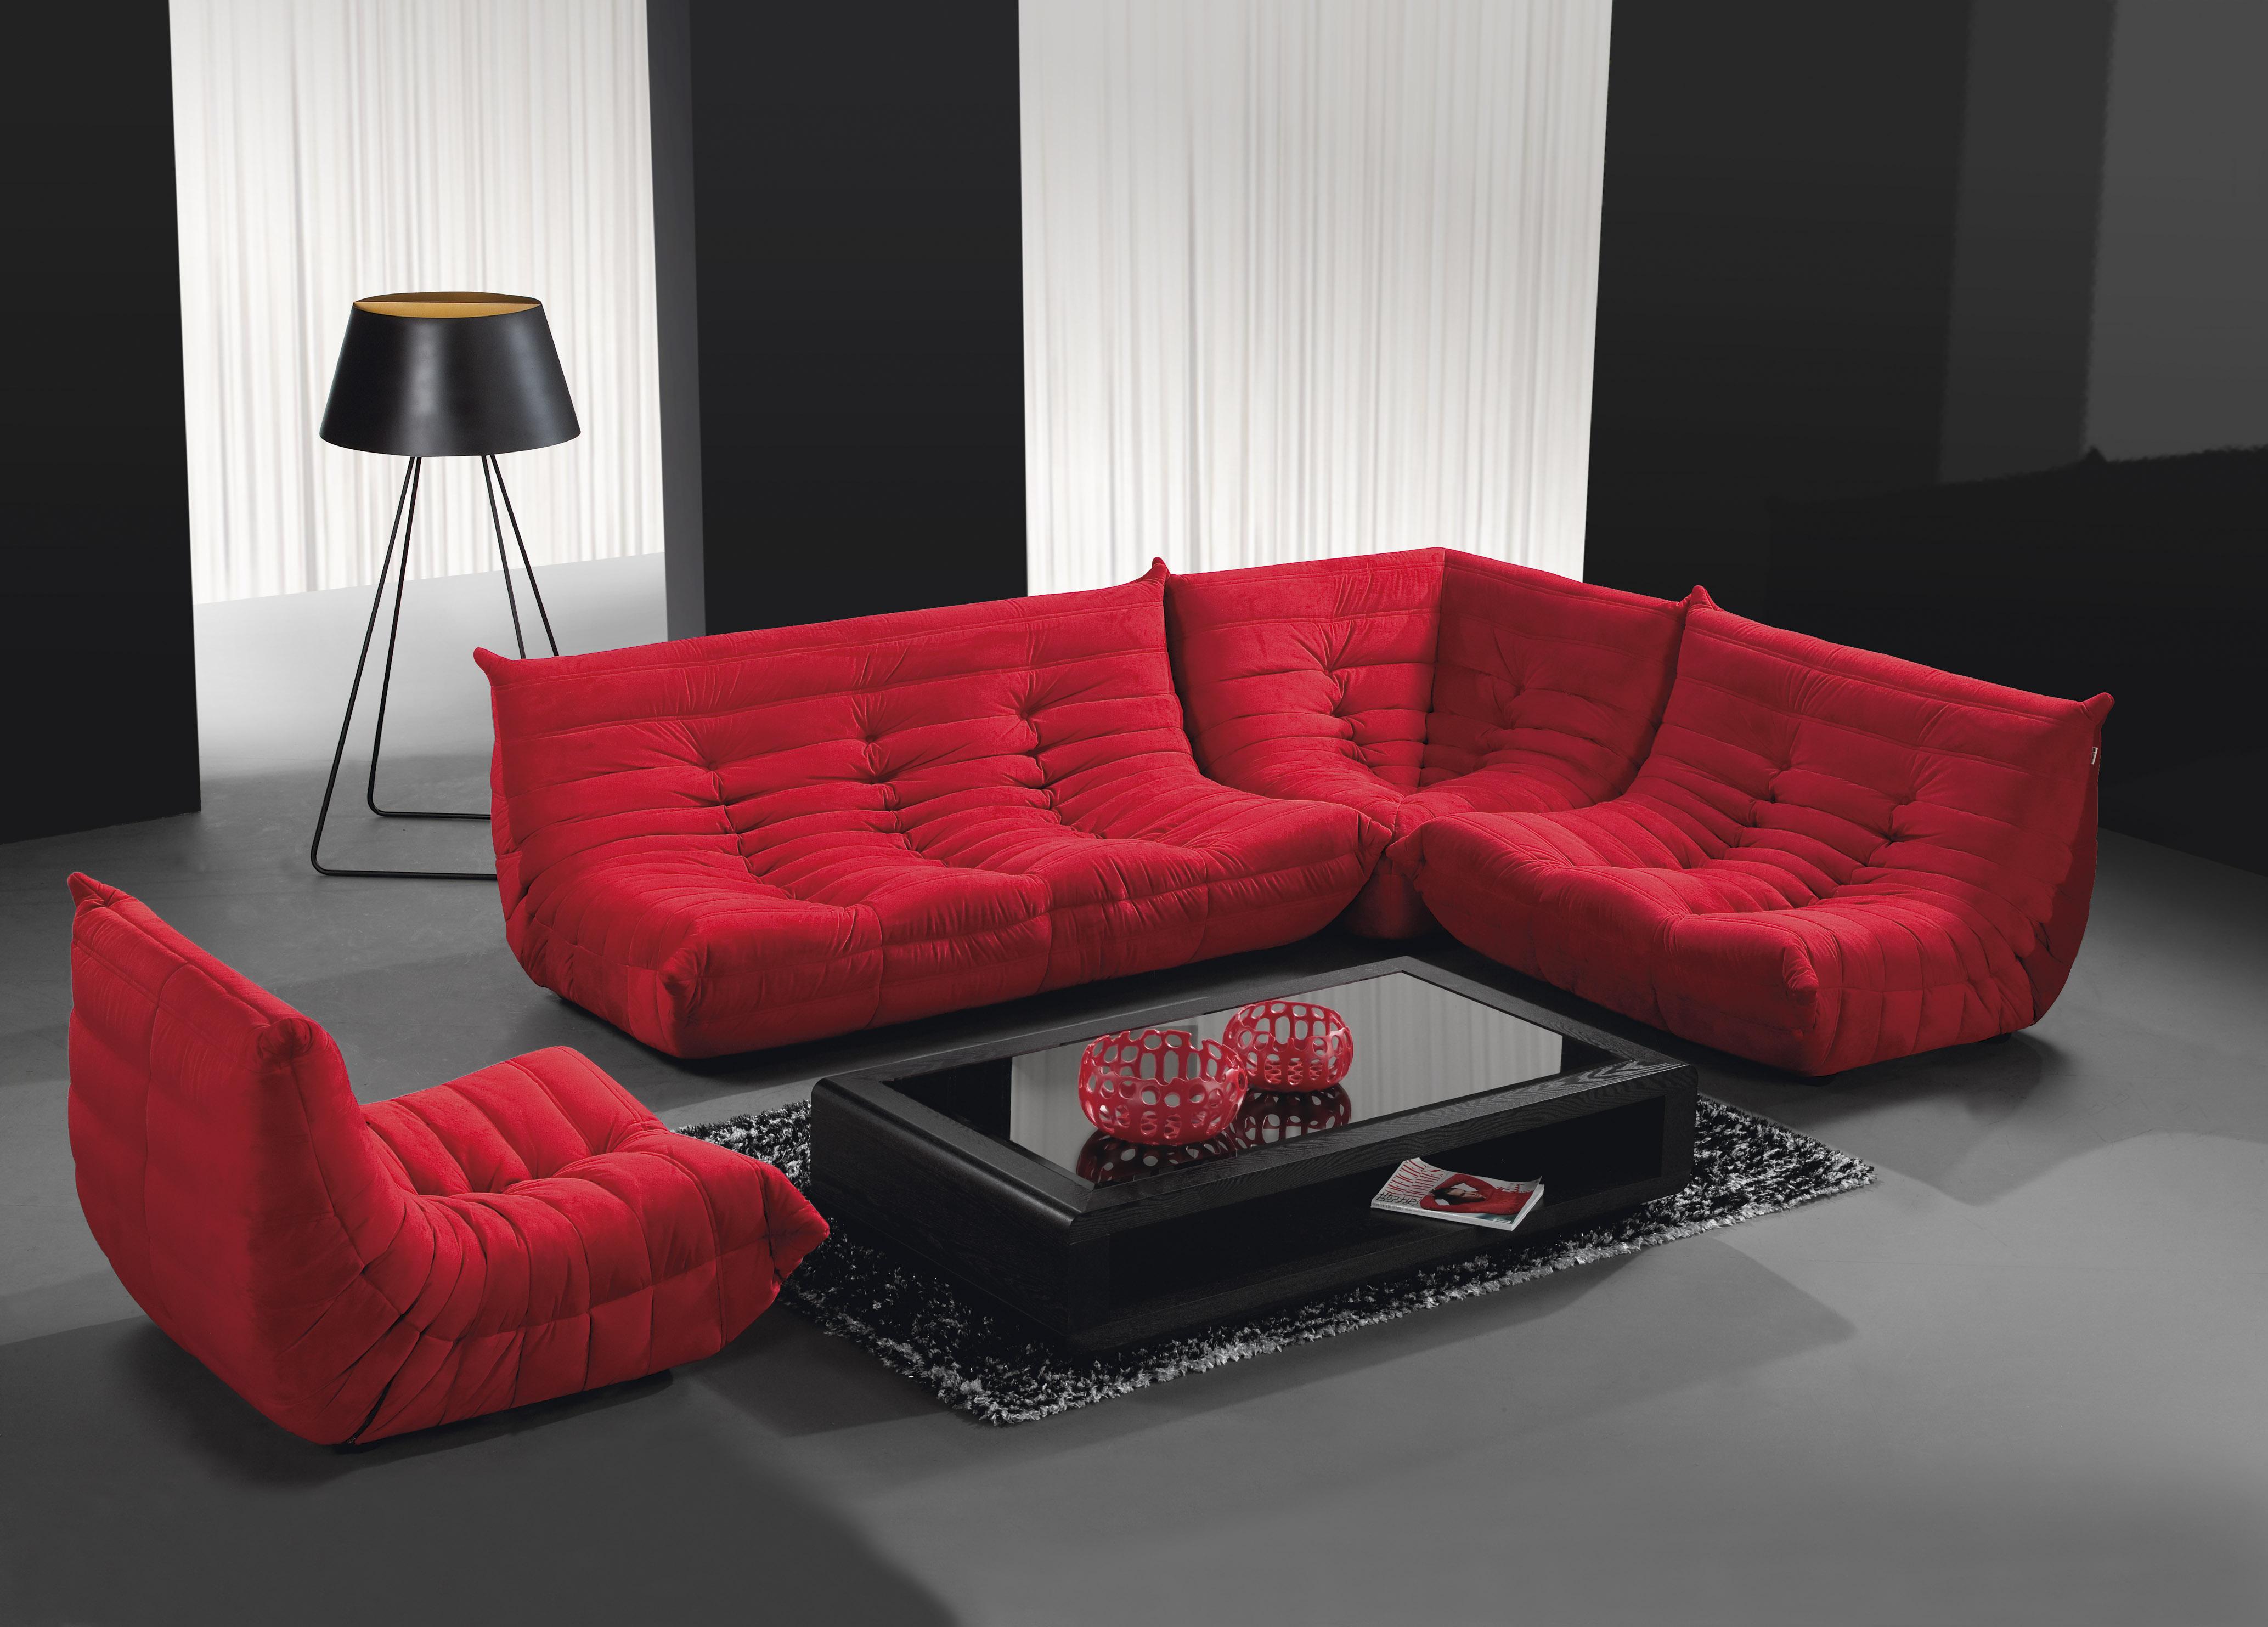 designer buffalo corner sofa by idus furniture store